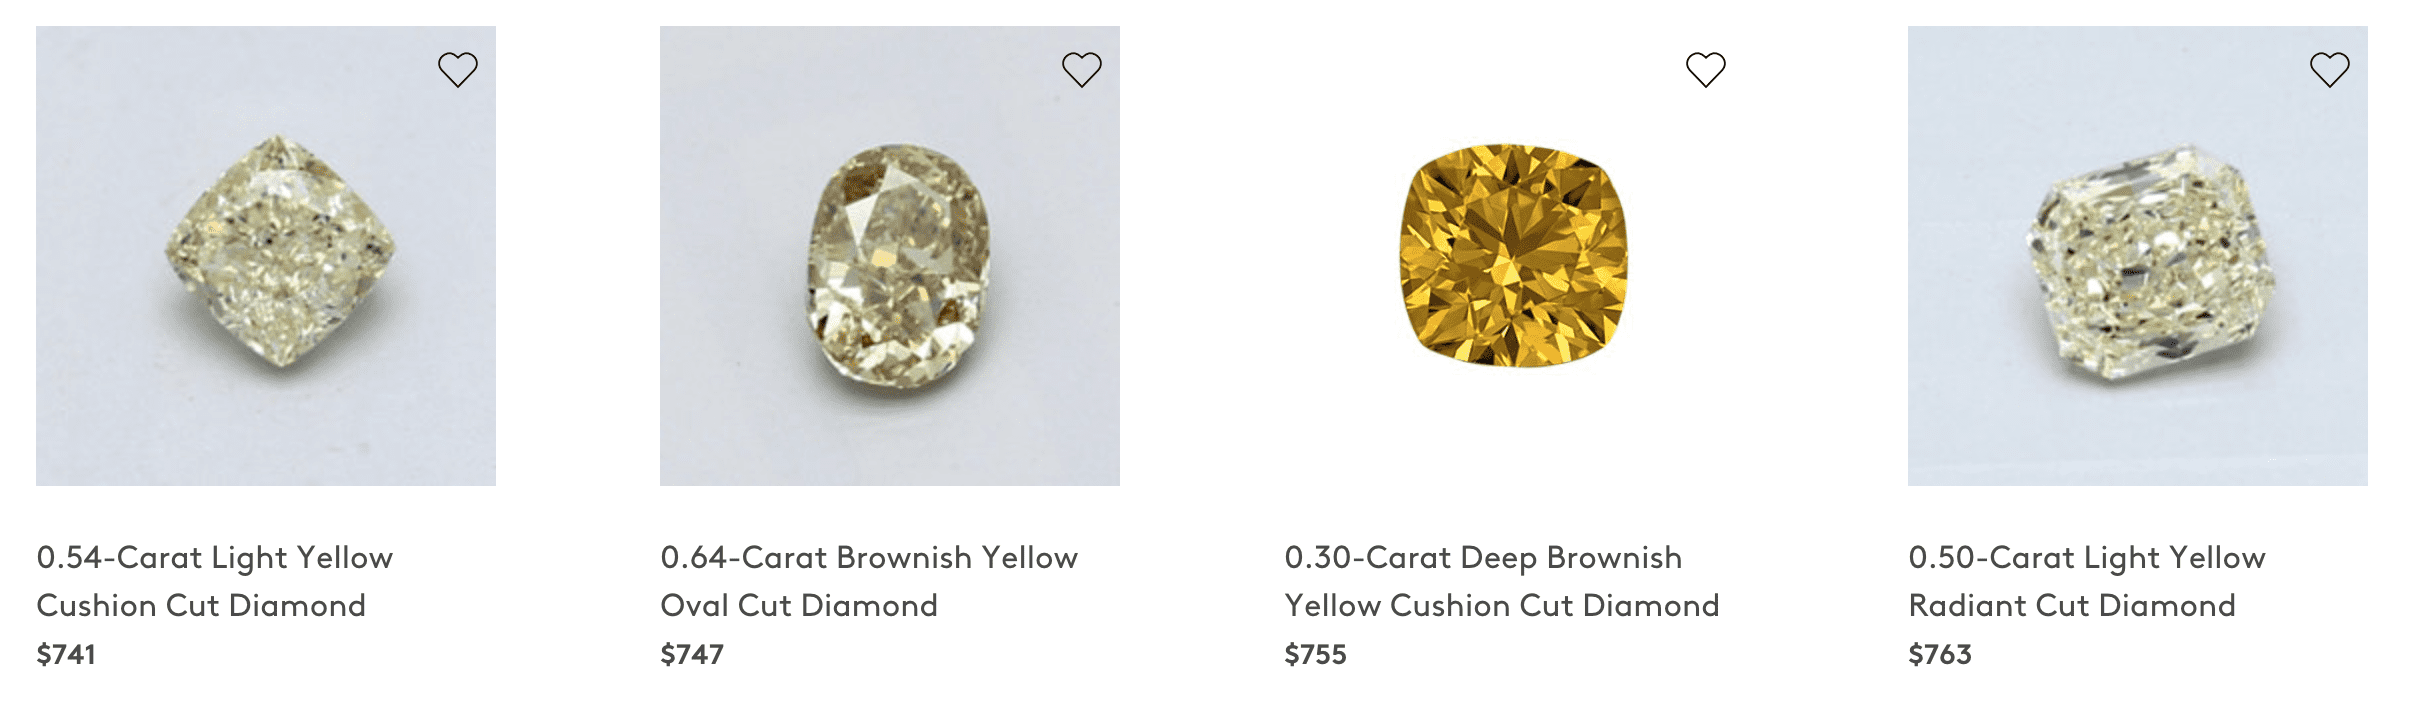 Buying Yellow Diamonds at Blue Nile